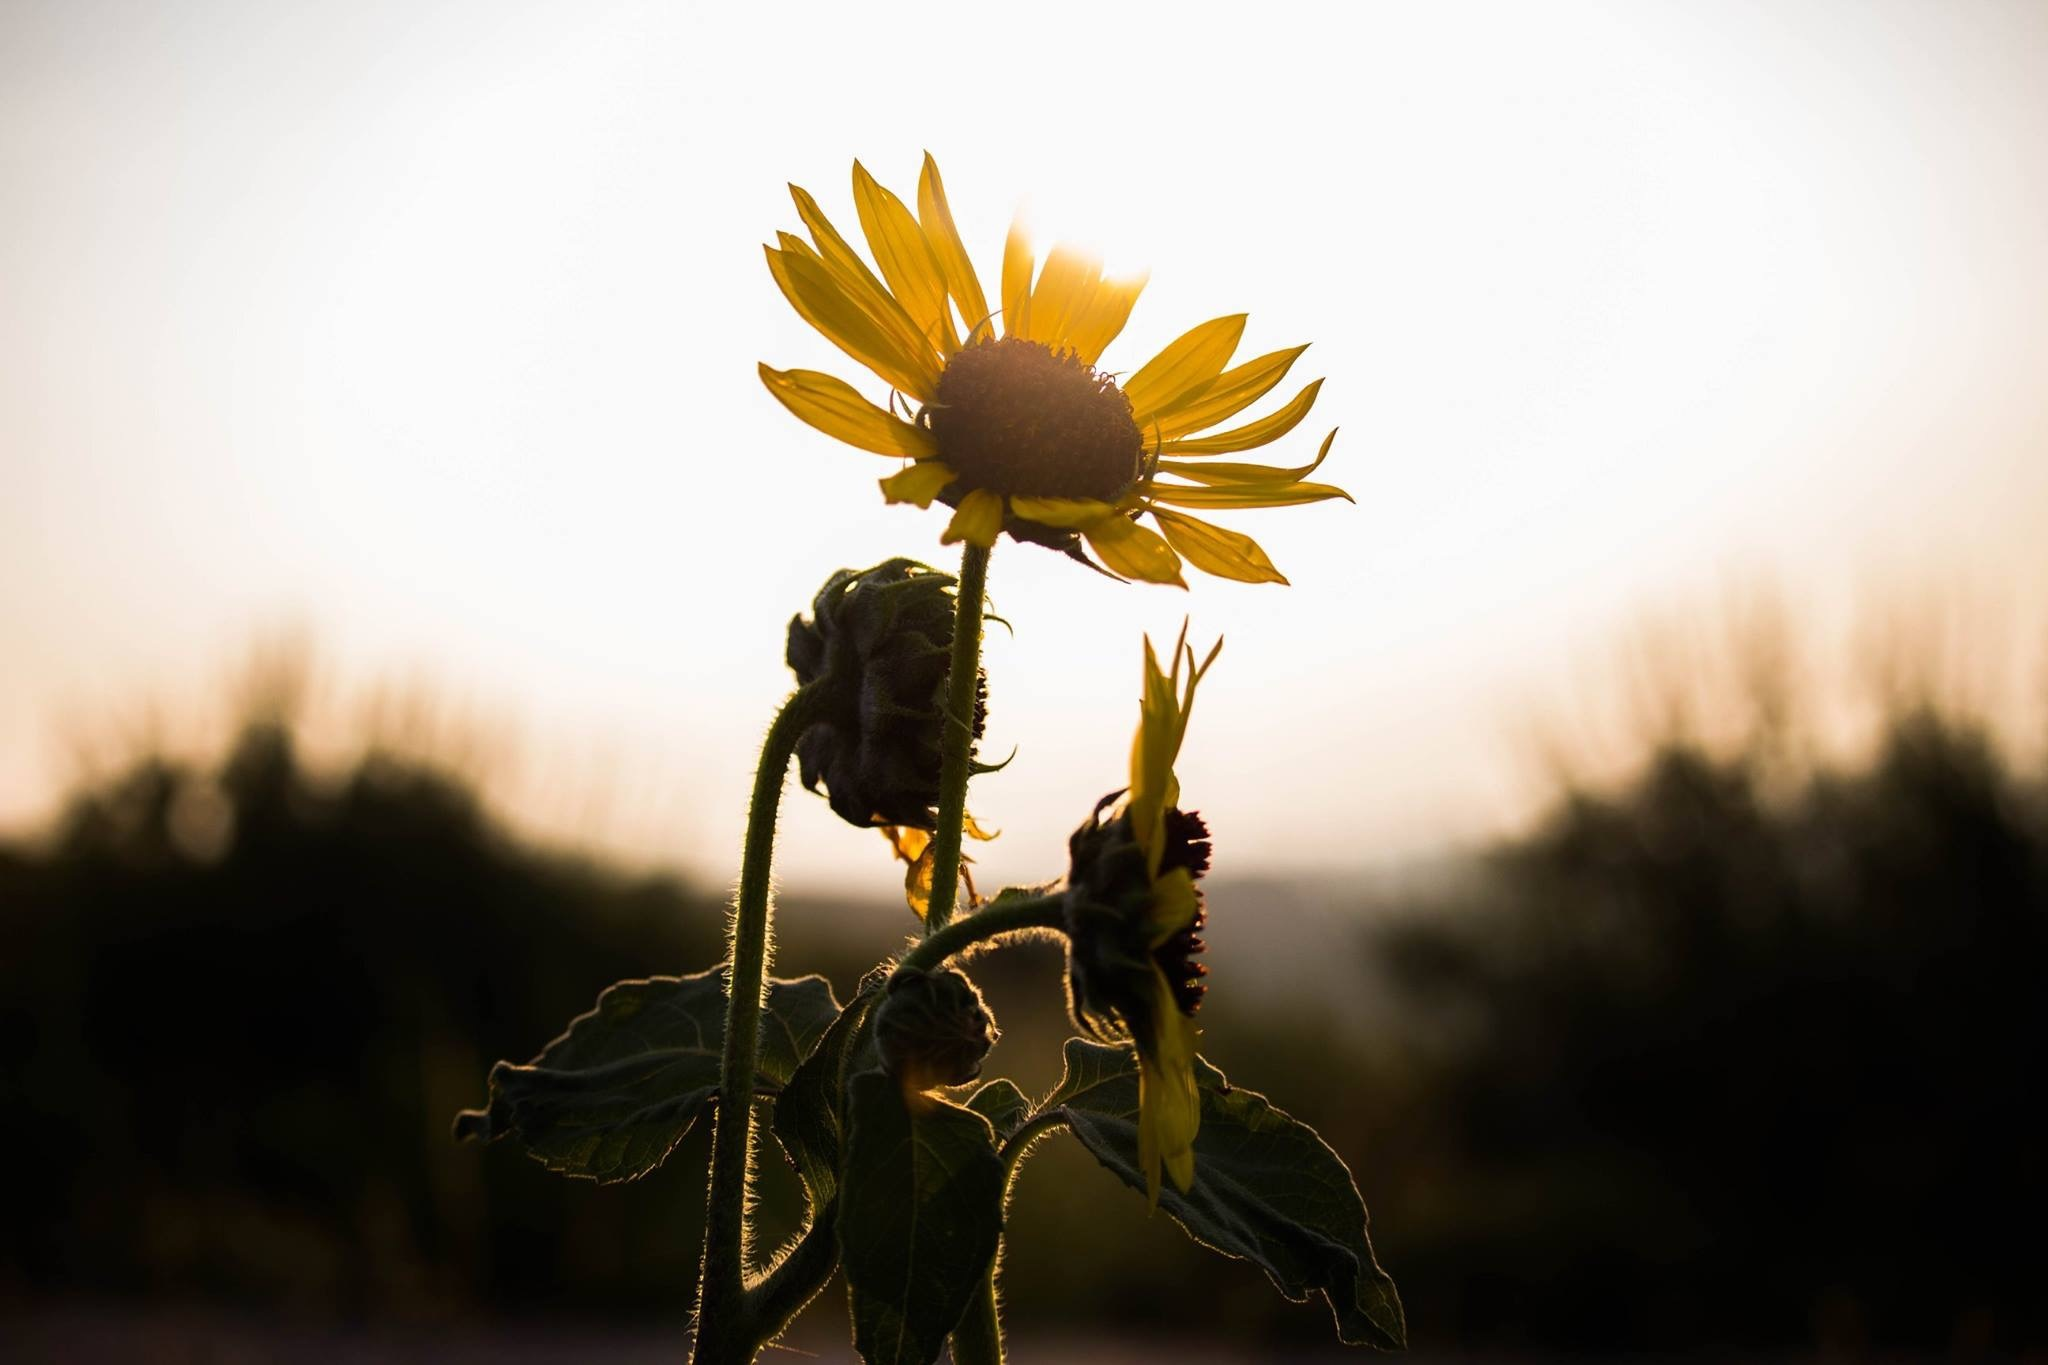 Flower by Kimberly Nicole Thornton